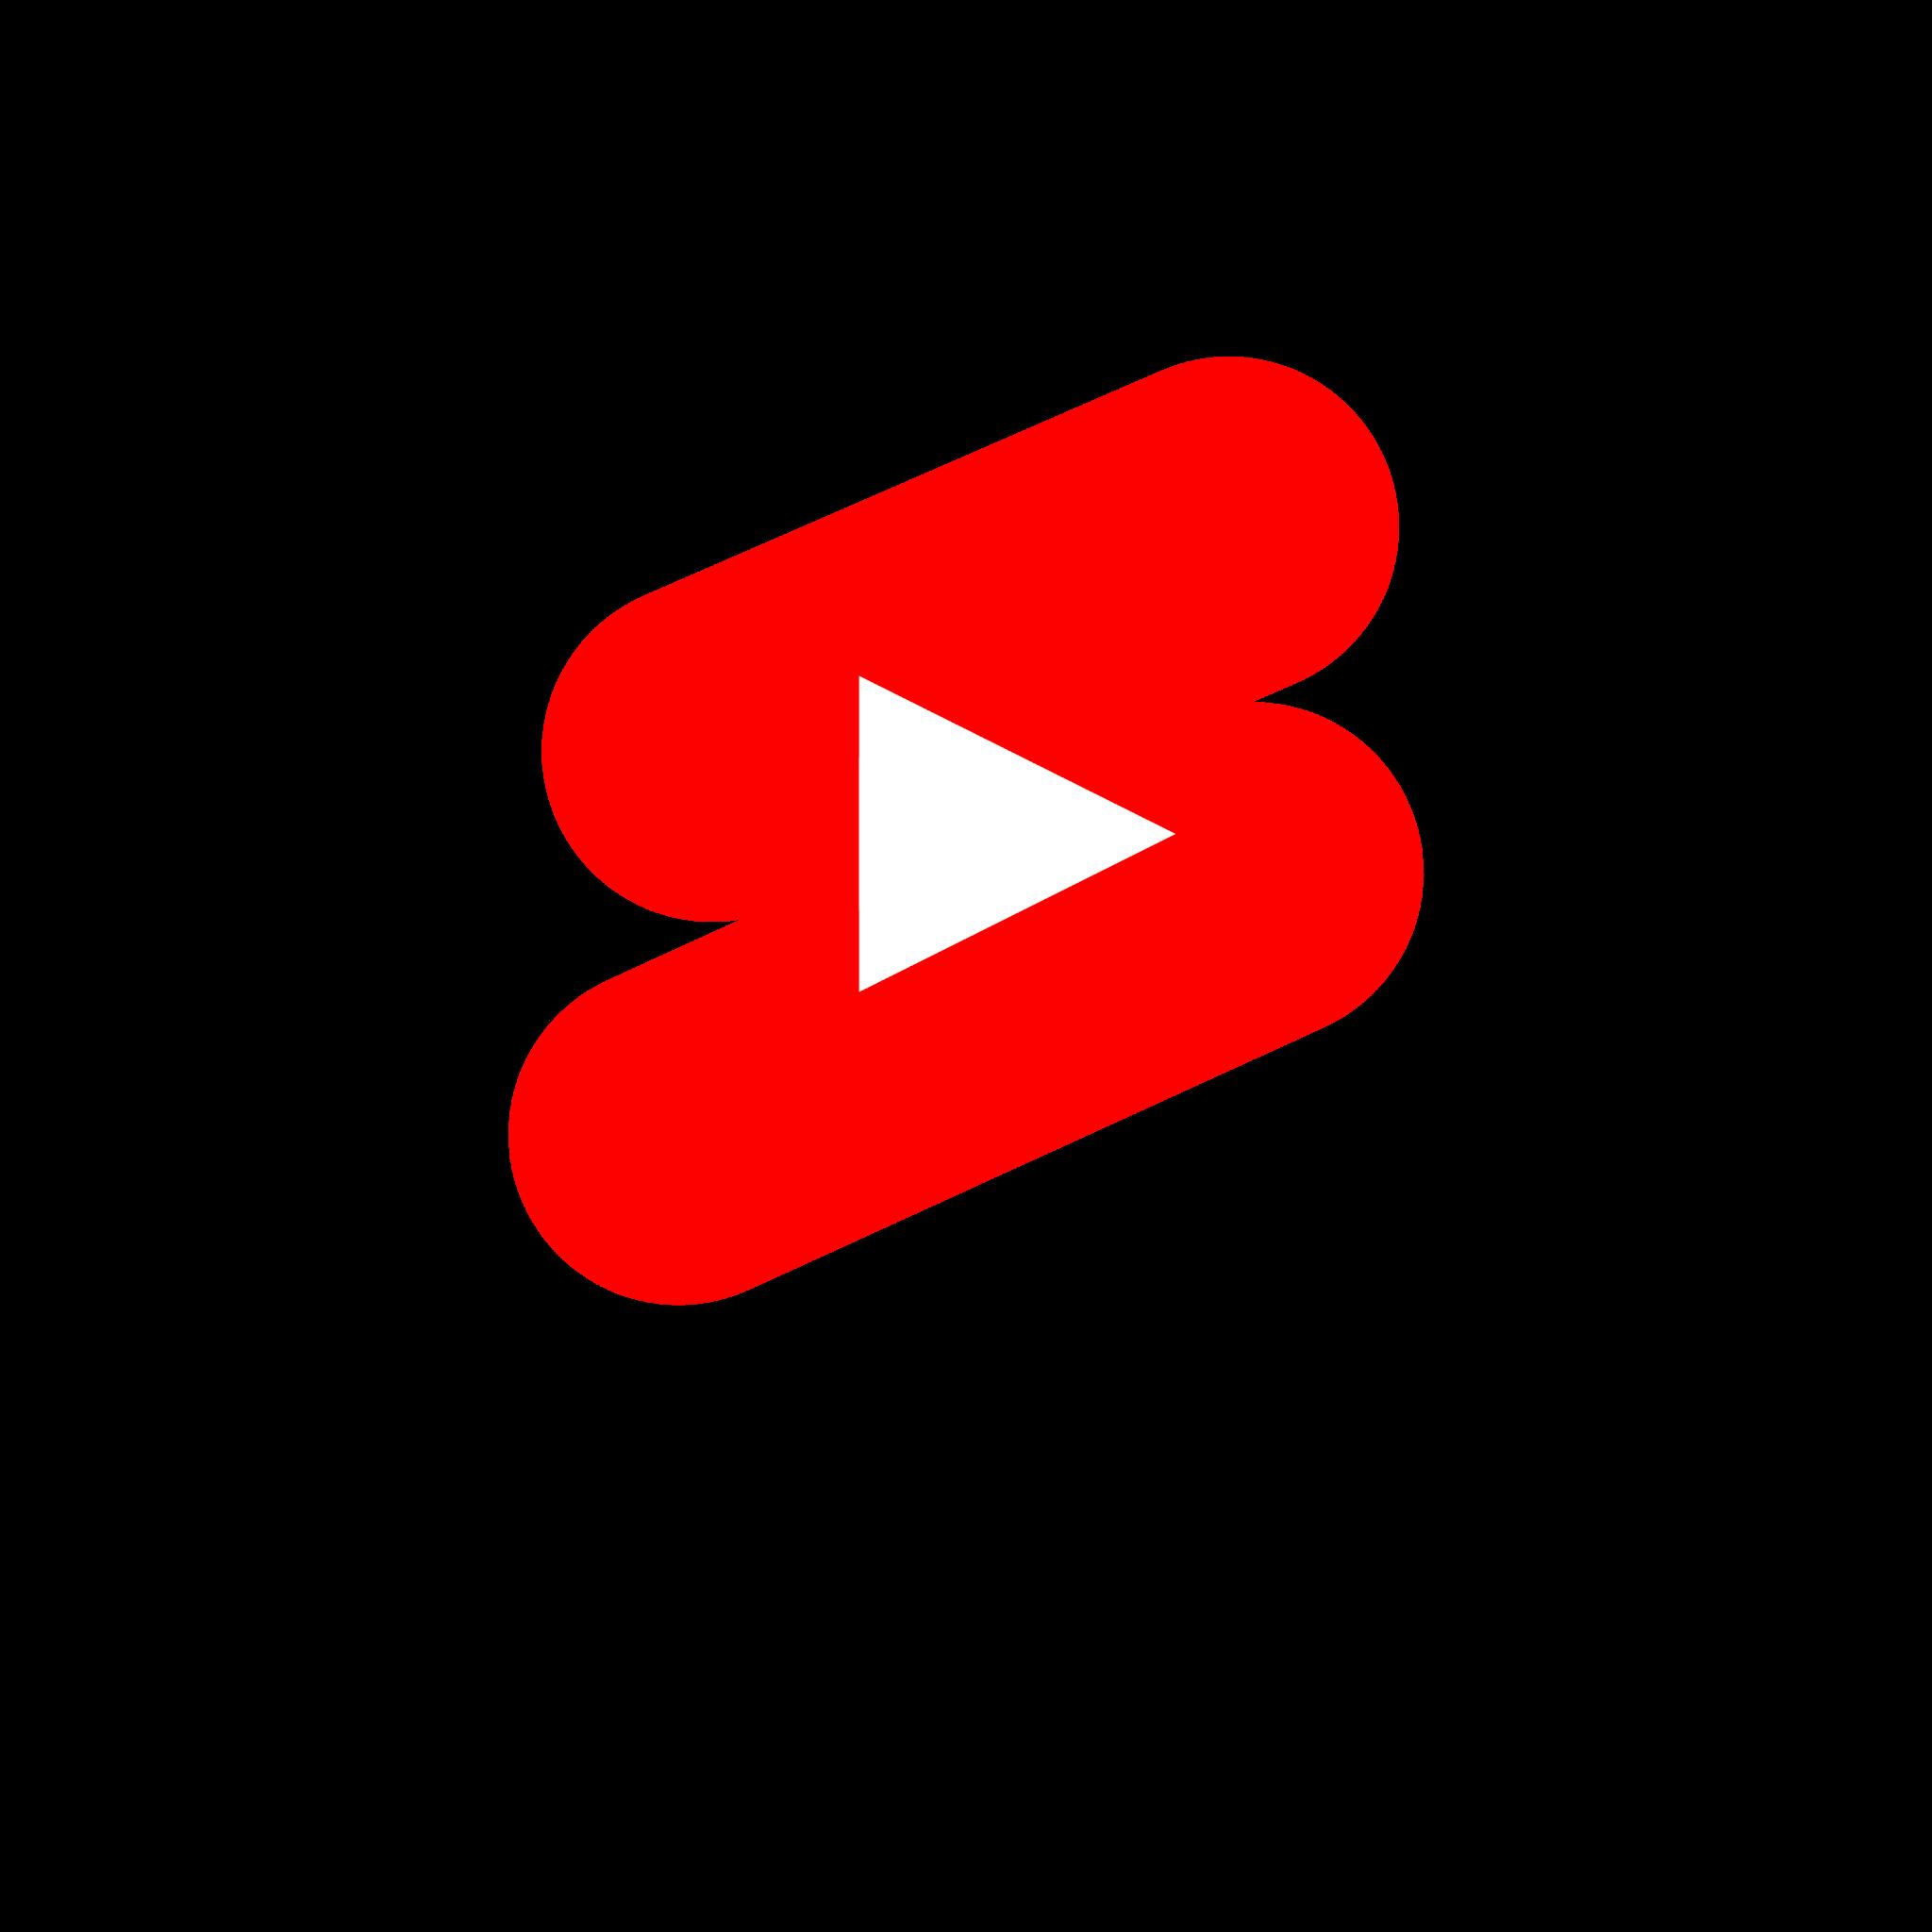 تحميل شعار يوتيوب شورت لوجو رسمي بصيغة شفافة Logo YouTube Short PNG